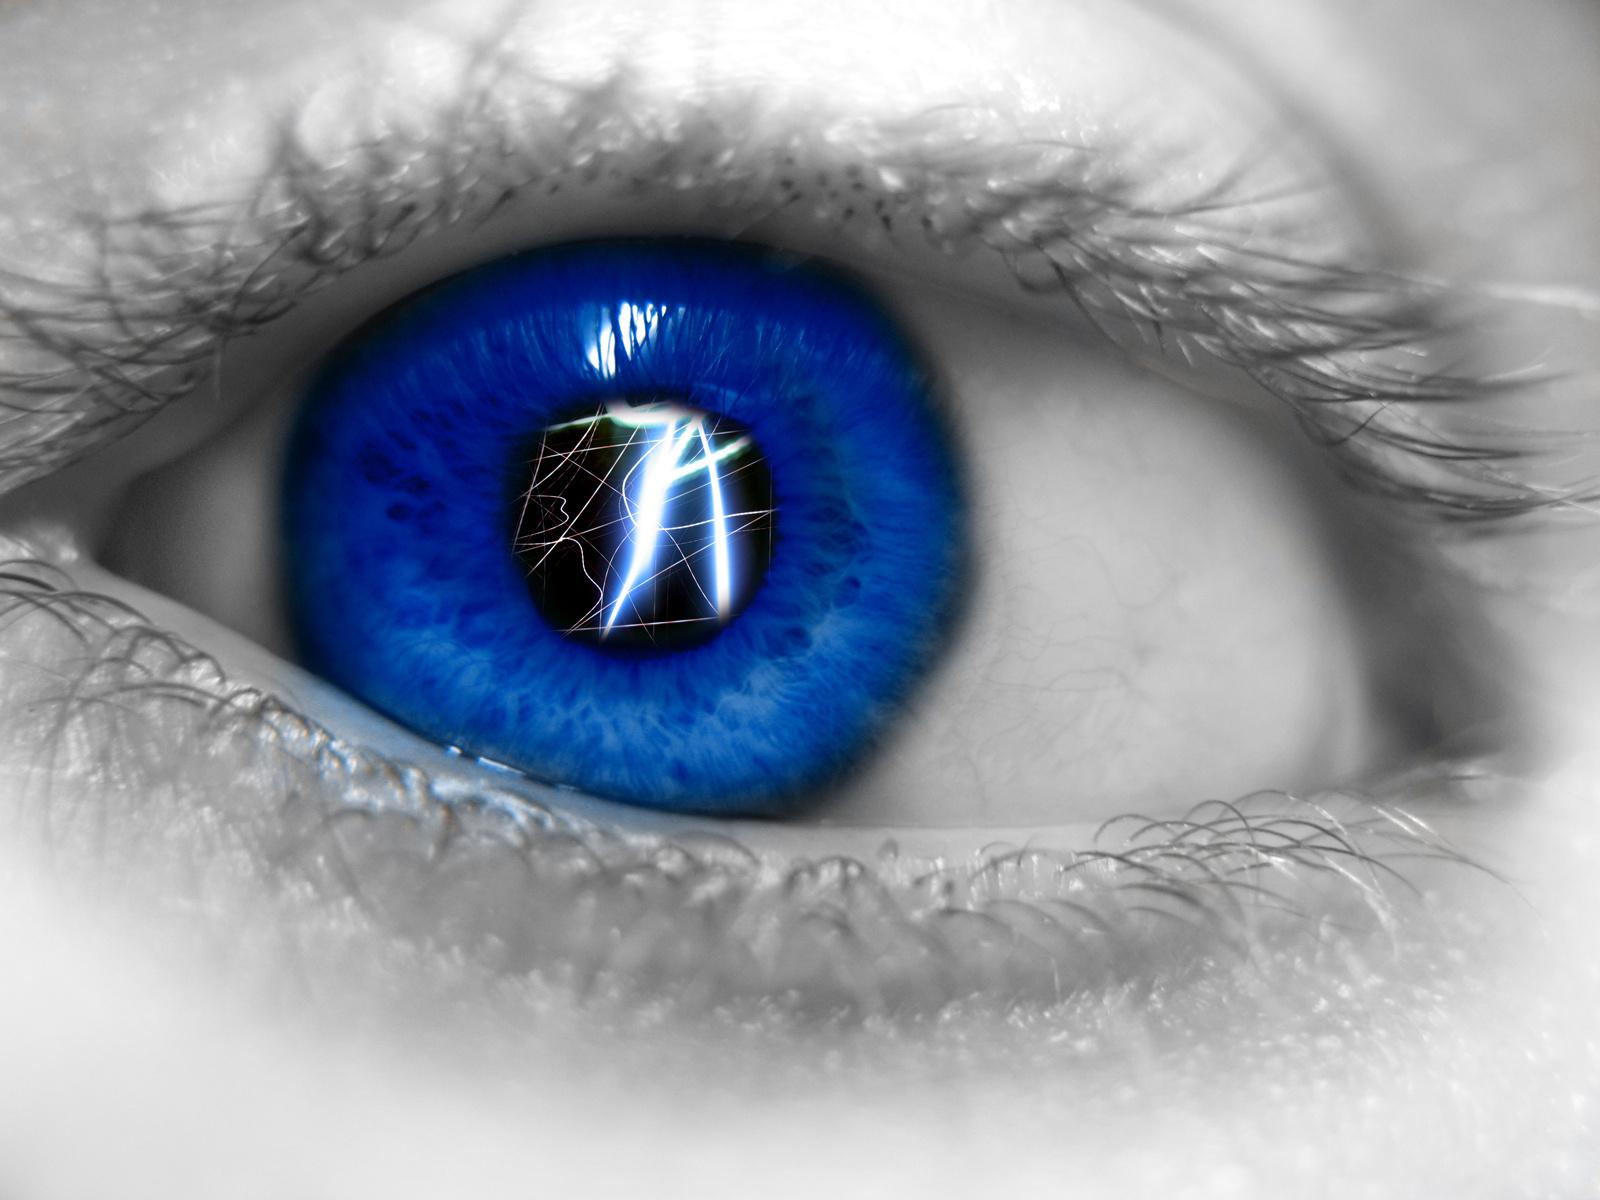 Download HQ blue light Eyes Wallpaper Num 3 1600 x 1200 1255 1600x1200